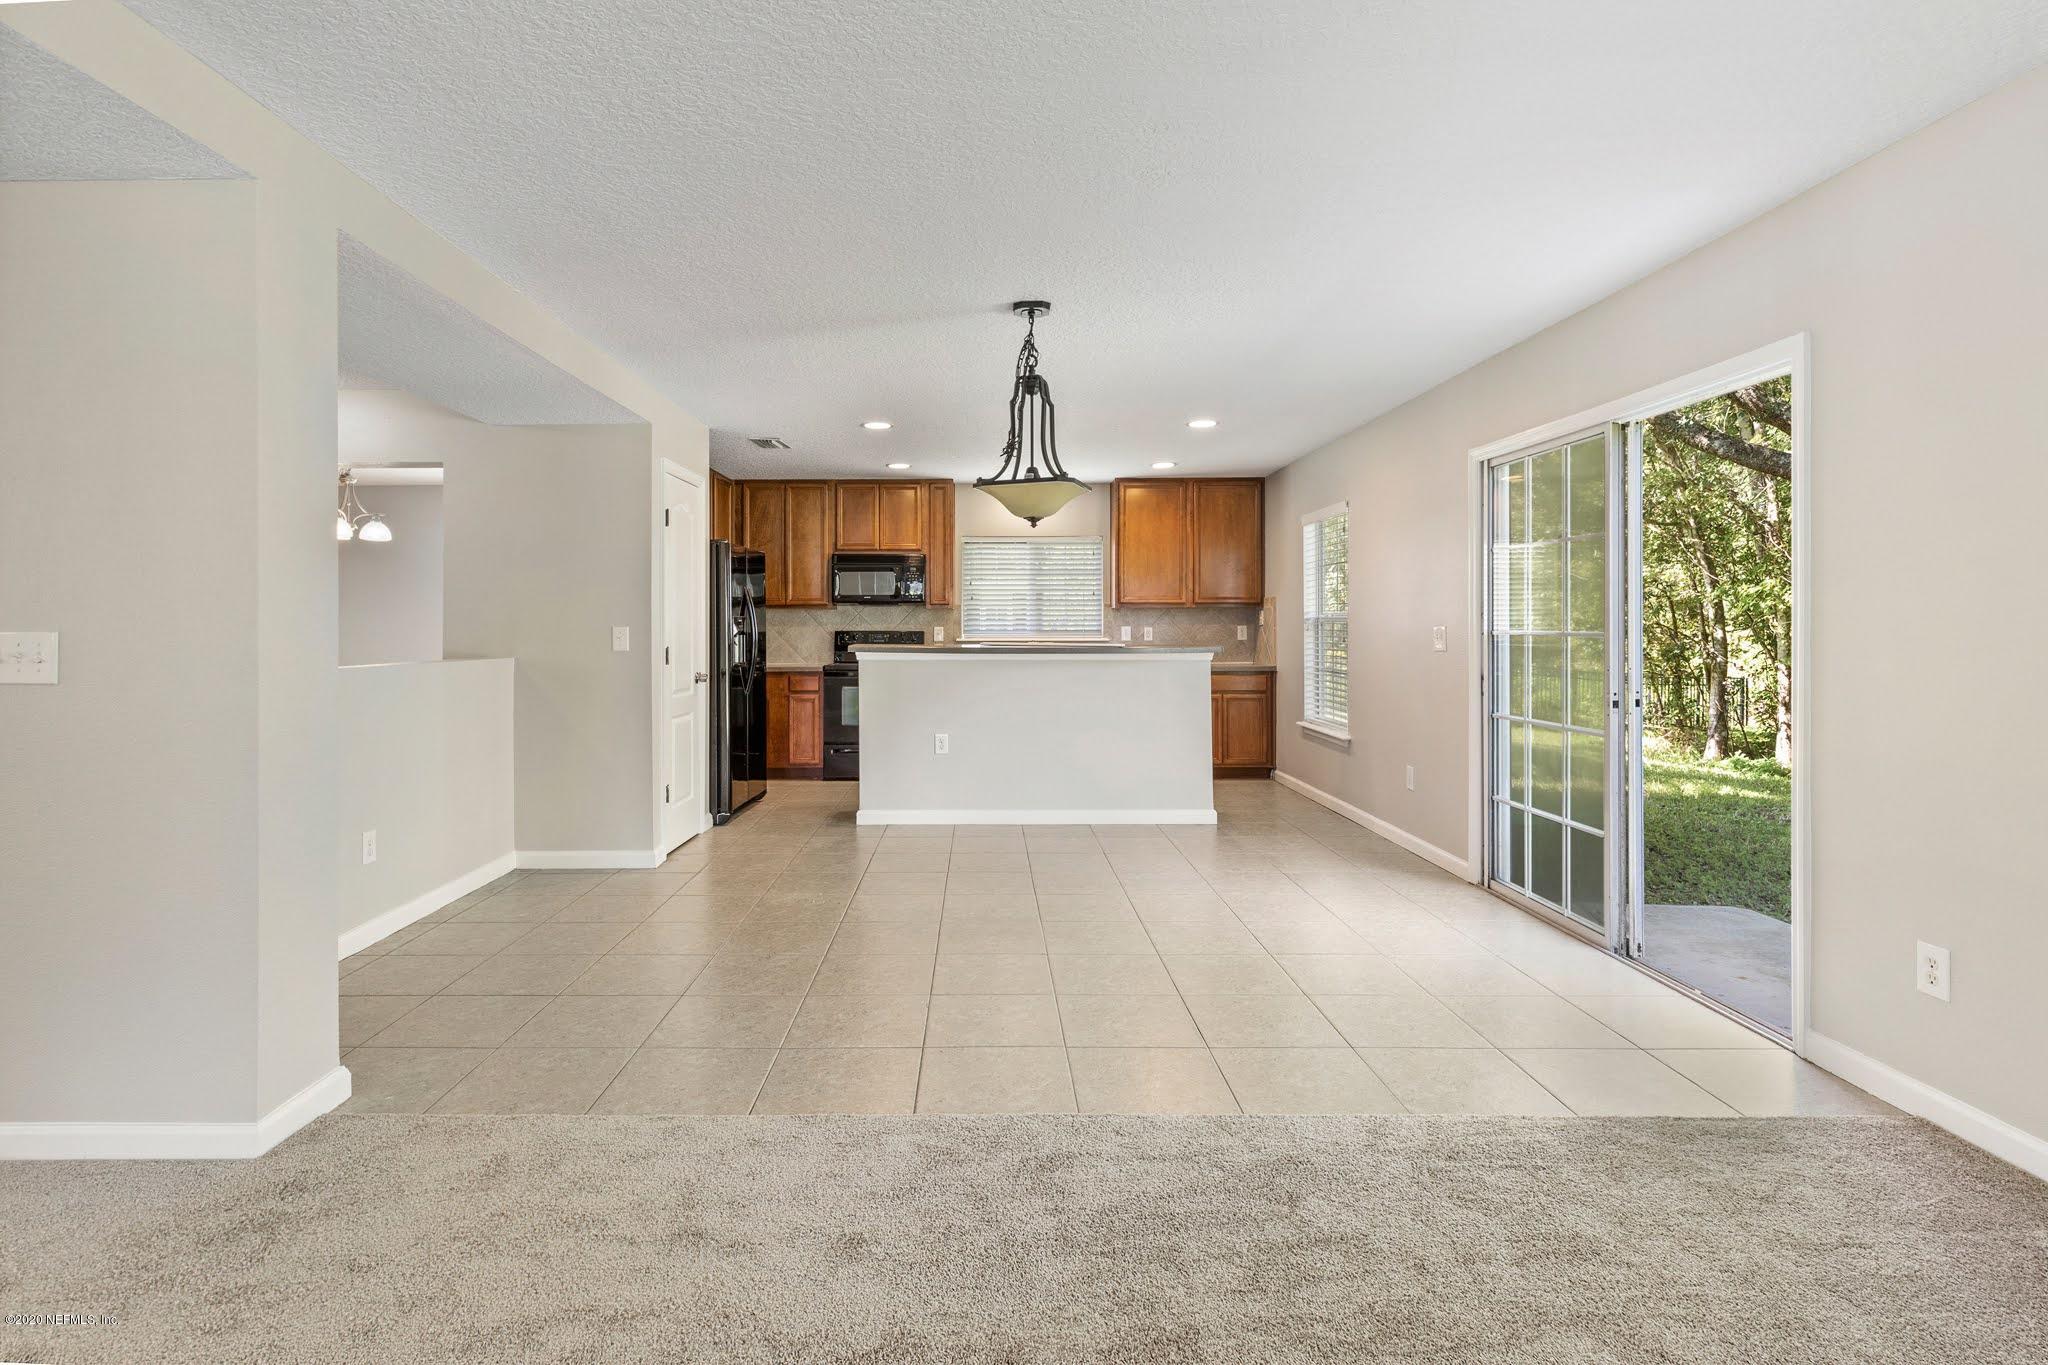 4911 CYPRESS LINKS, ELKTON, FLORIDA 32033, 3 Bedrooms Bedrooms, ,2 BathroomsBathrooms,Residential,For sale,CYPRESS LINKS,1075096